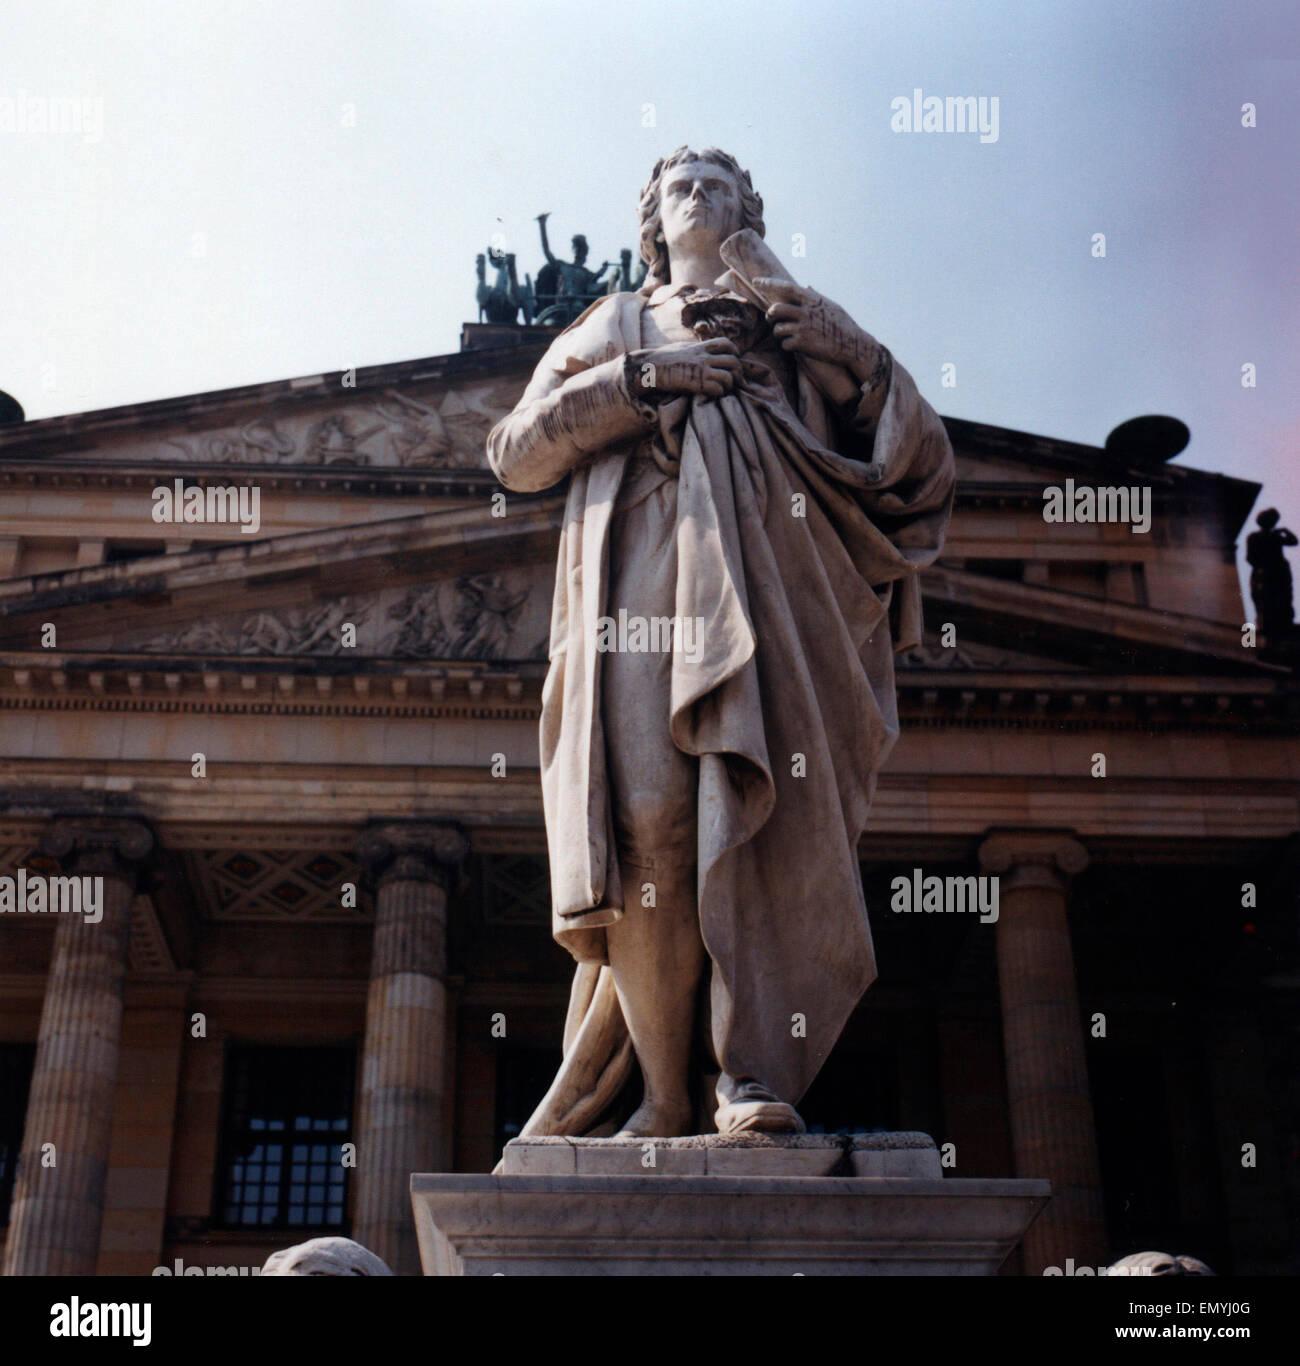 JULY 2003 - BERLIN: the Friedrich Schiller memorial/ statue in fron of the 'Konzerthaus' (Concert Hall) - Stock Image